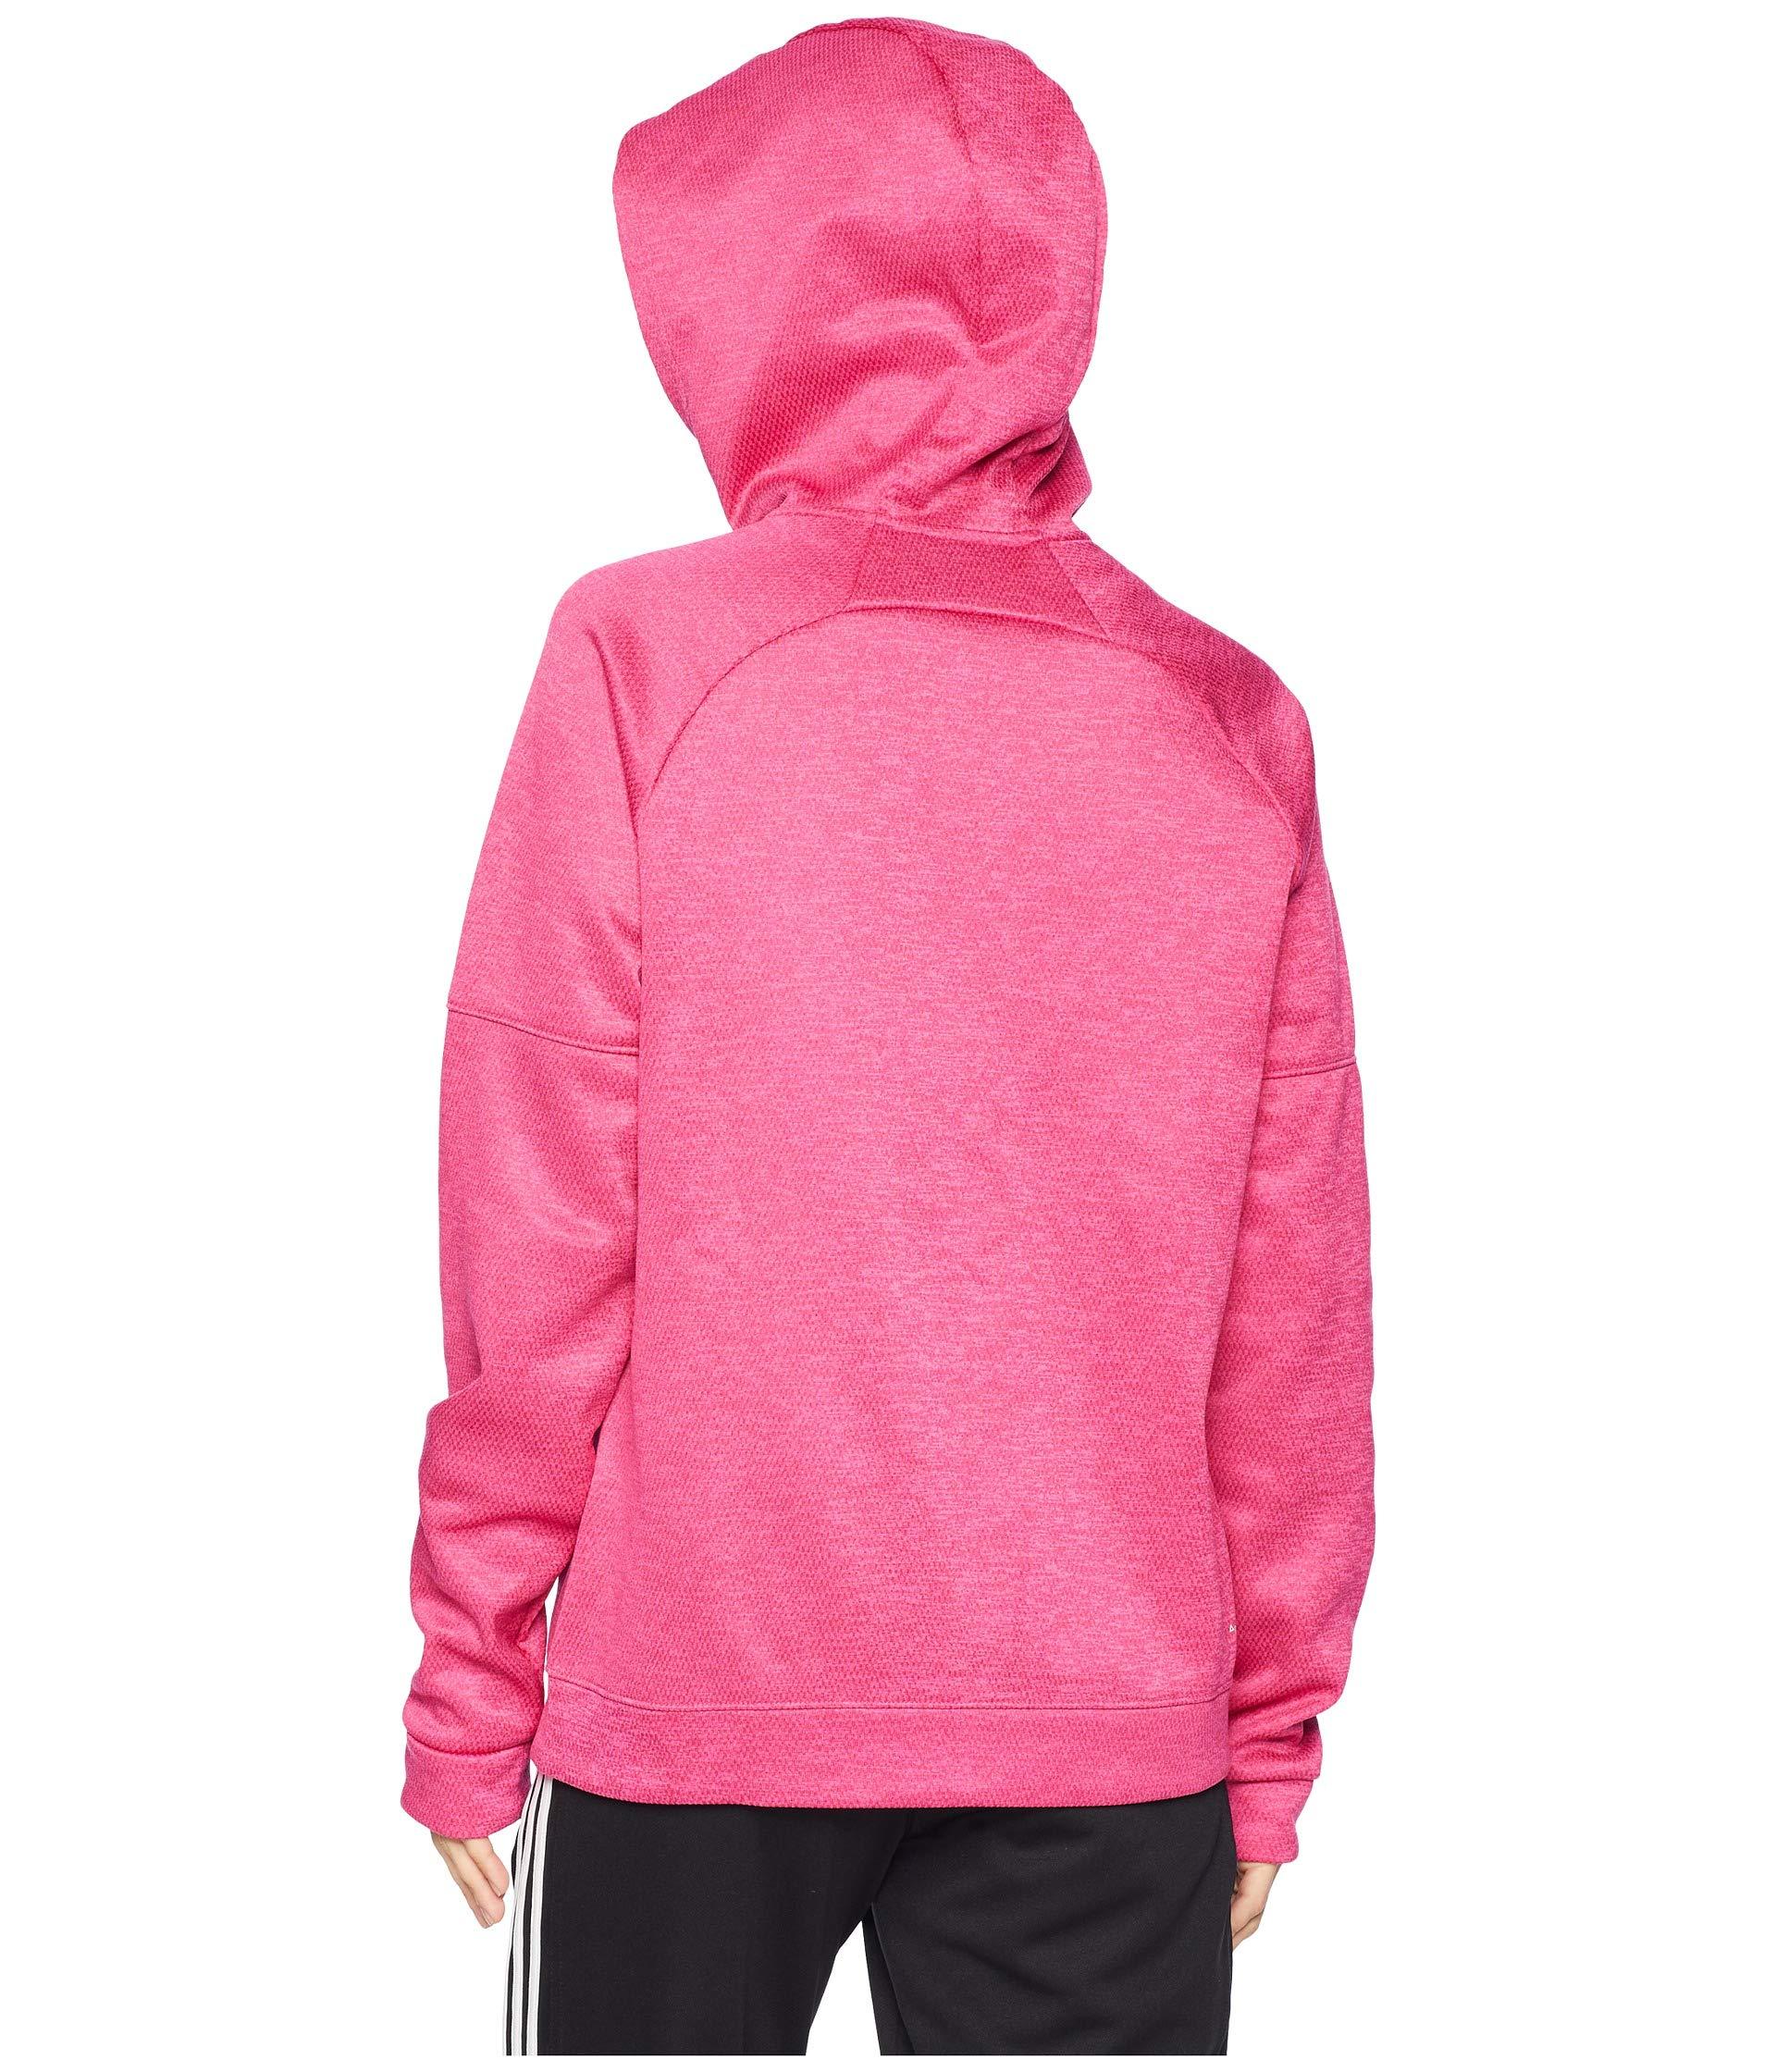 Hoodie Magenta Adidas Issue Real Zip Team Full WwIw4qv